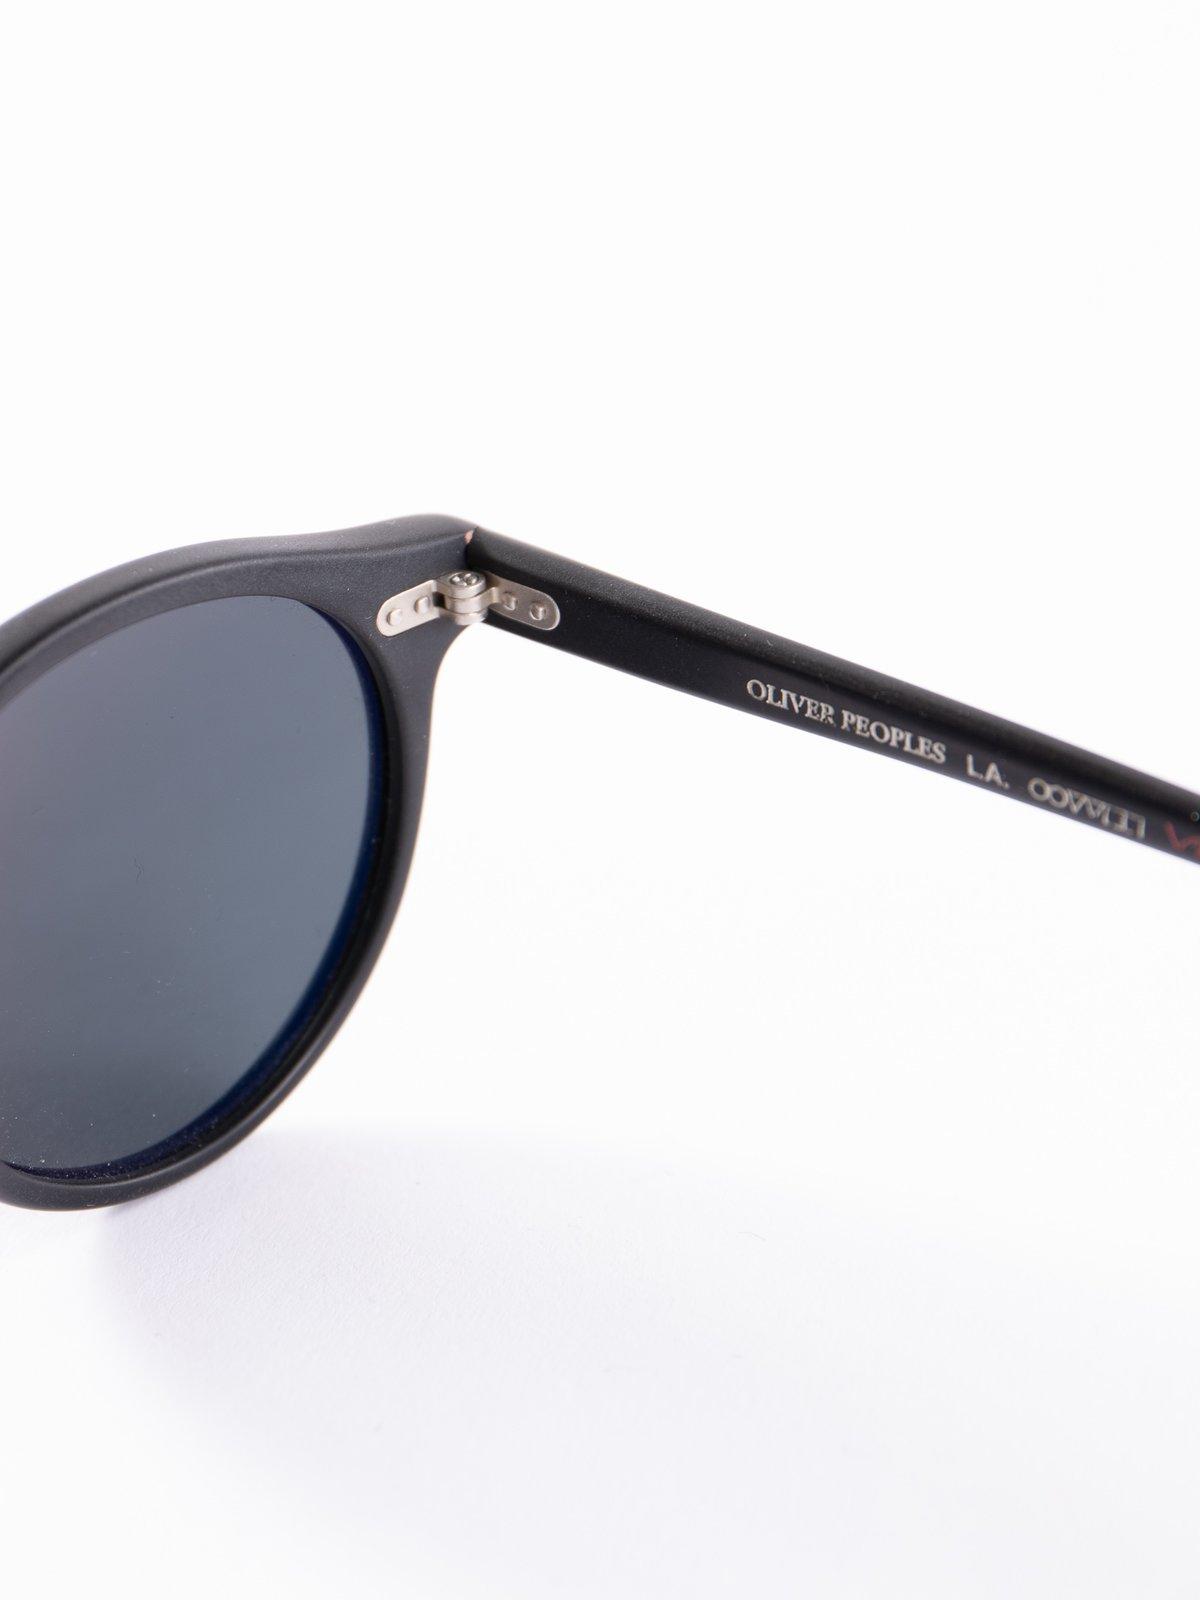 Semi–Matte Black/Dark Grey Polar Gregory Peck Sunglasses - Image 4